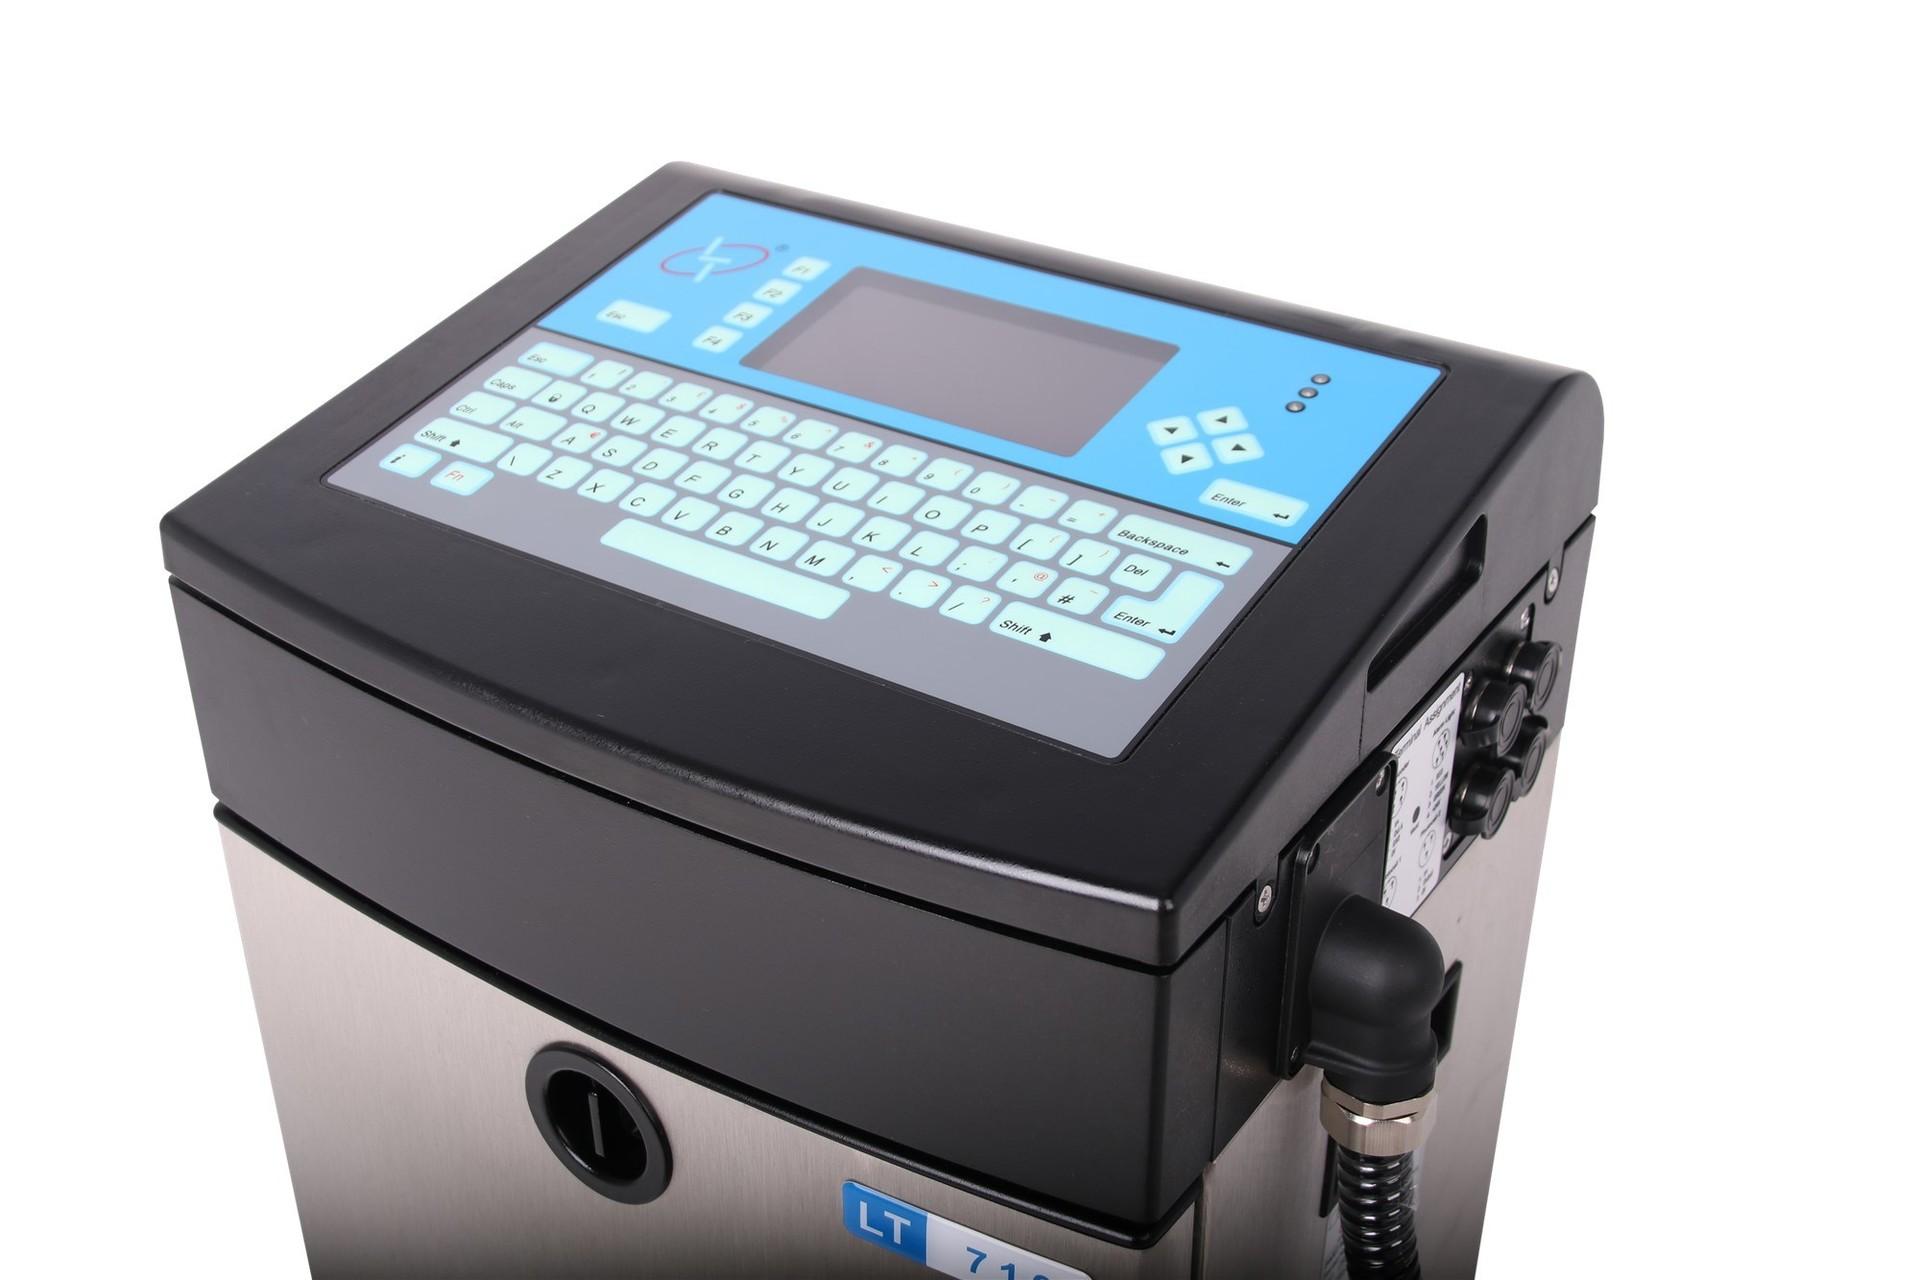 Lead Tech Lt710 HDPE Coding Continuous Cij Inkjet Printer